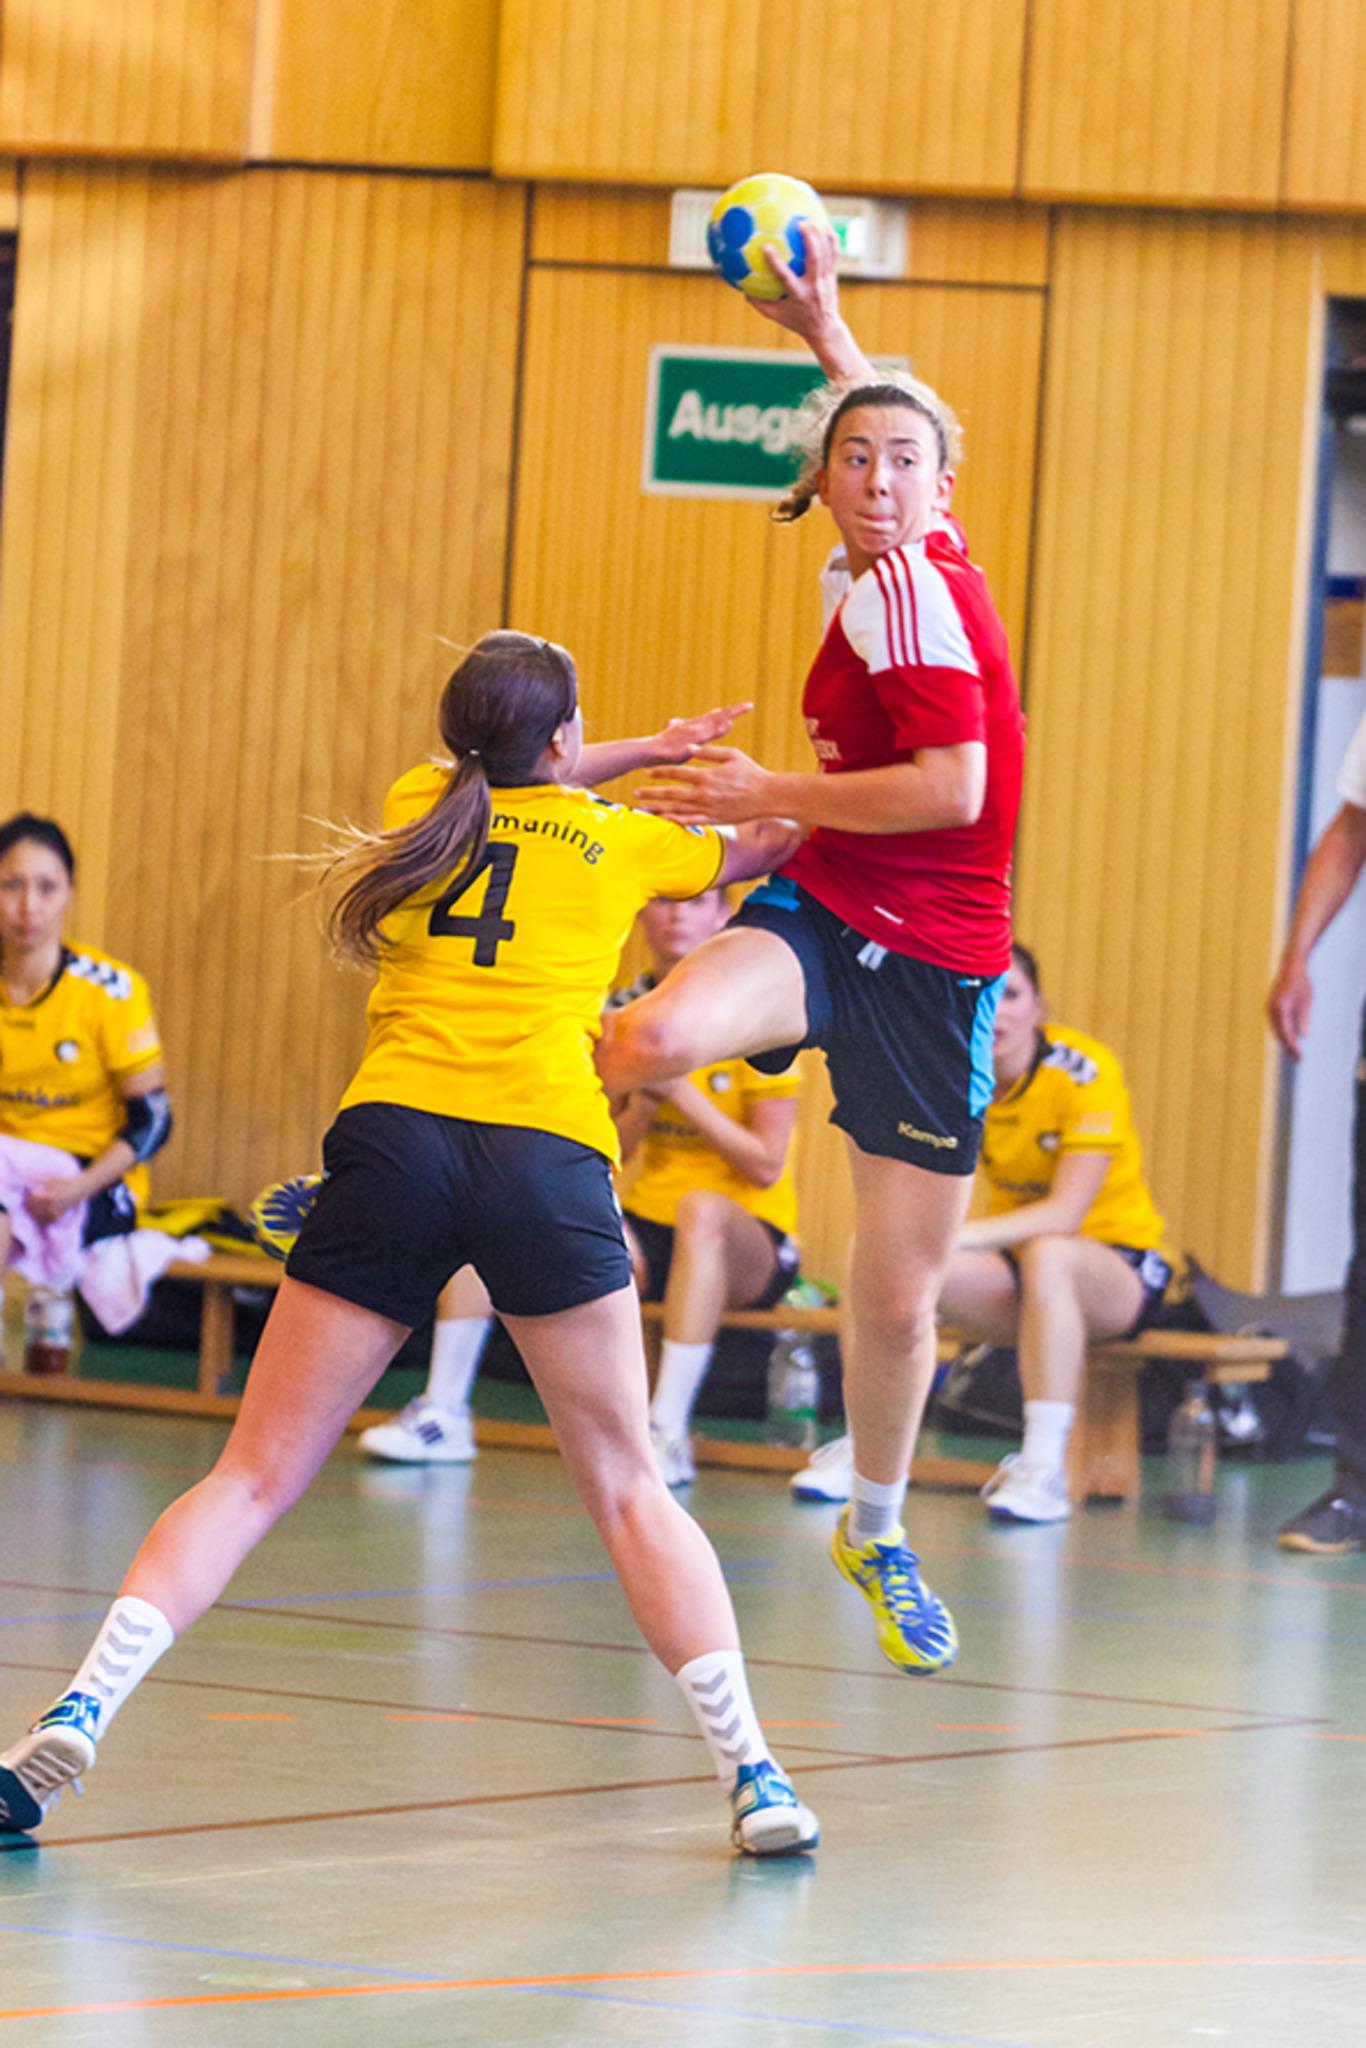 Laim Handball